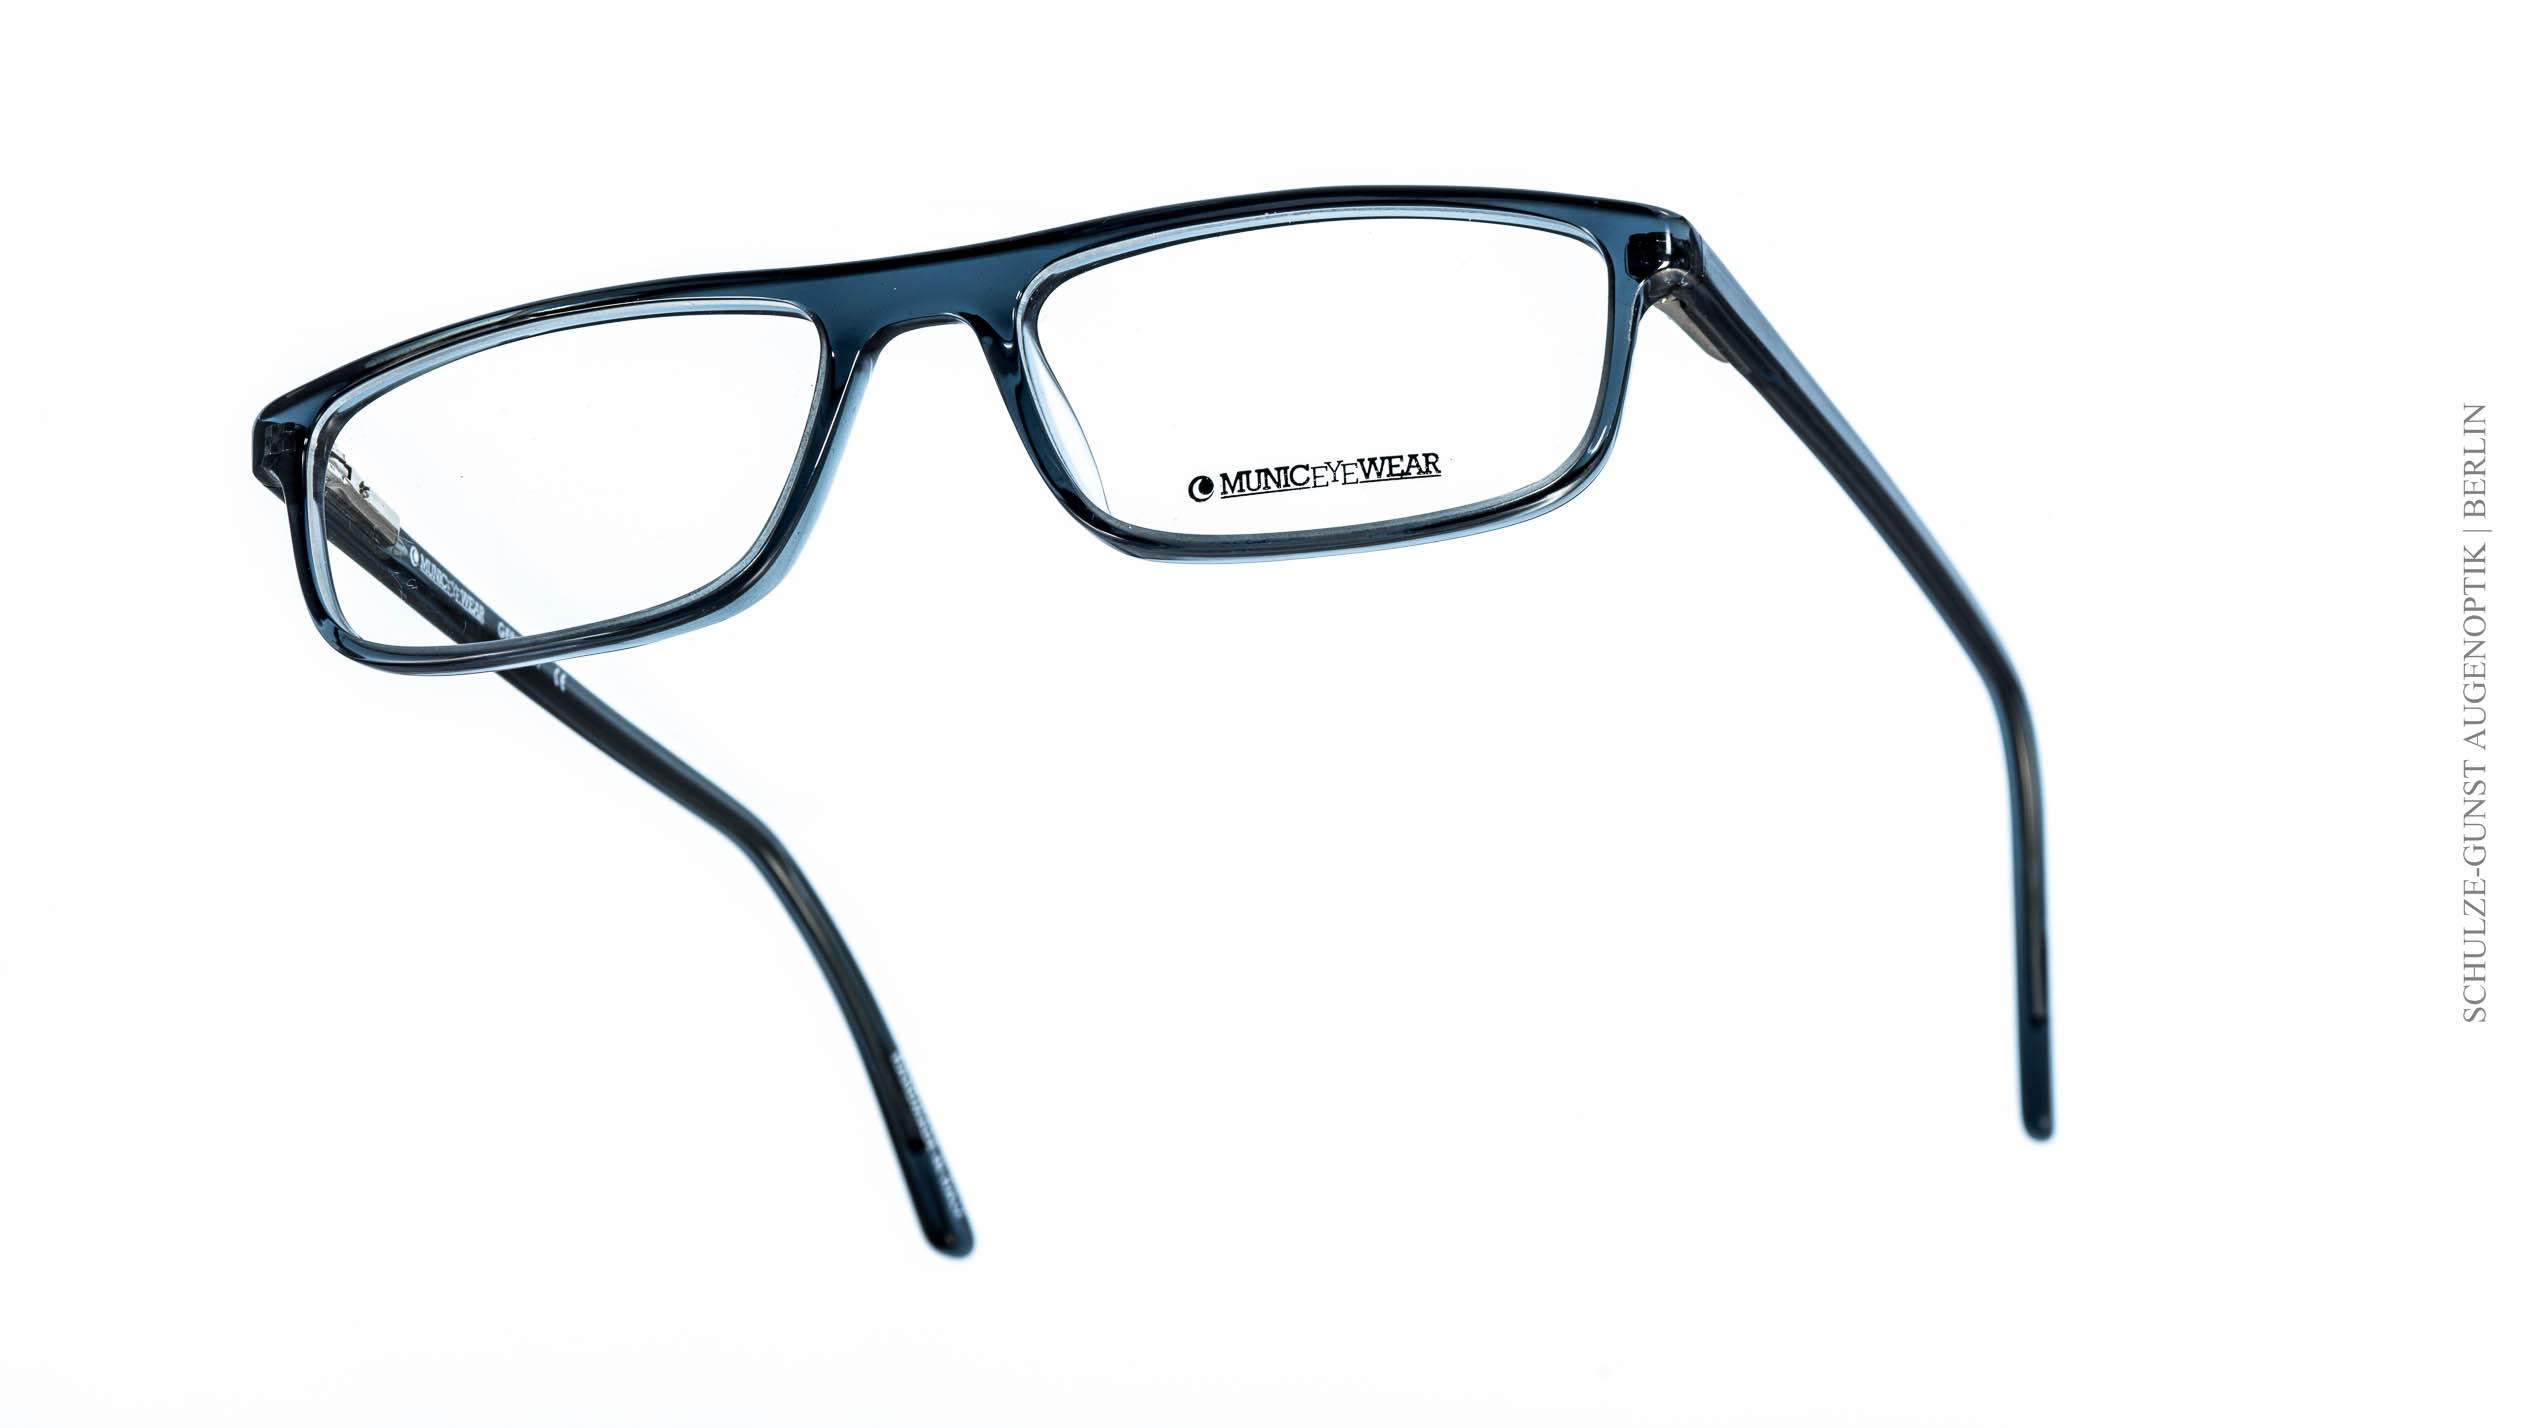 8094 – Munic Eyewear / 246 - SCHULZE-GUNST Augenoptik seit 1894